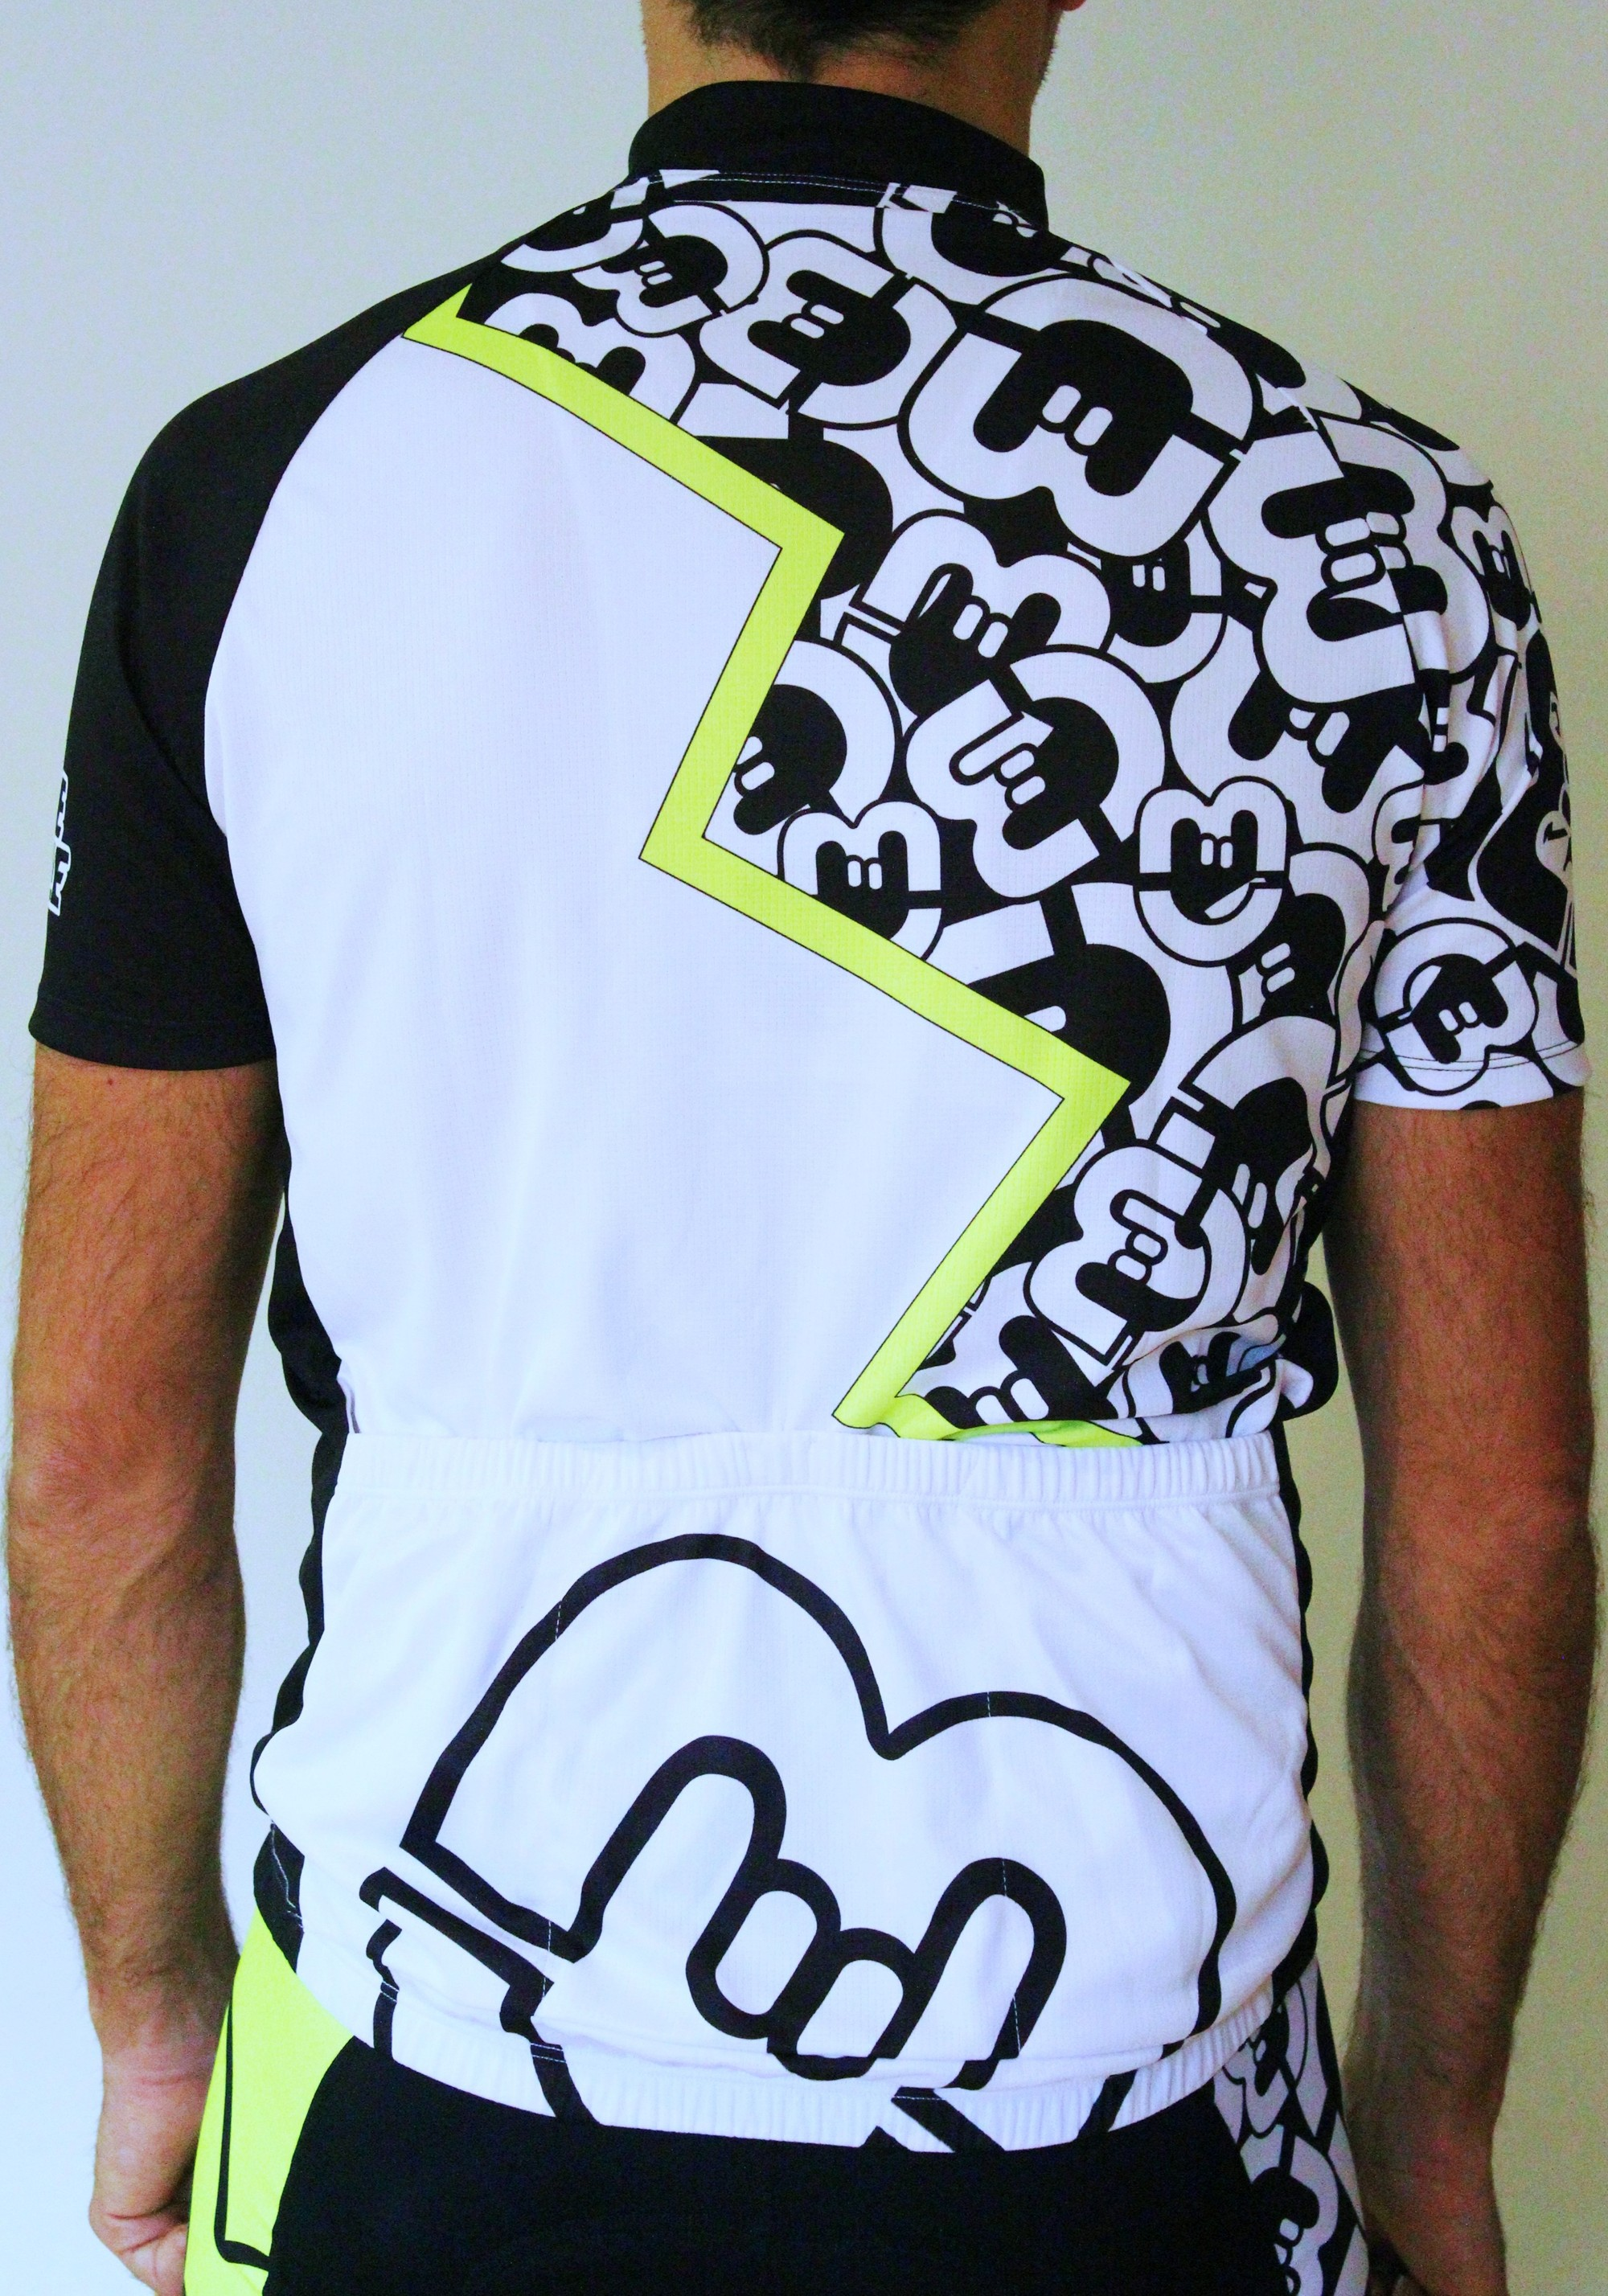 70703fa49 Camiseta de manga corta para ciclismo (mtb o carretera) de CoreBicycle